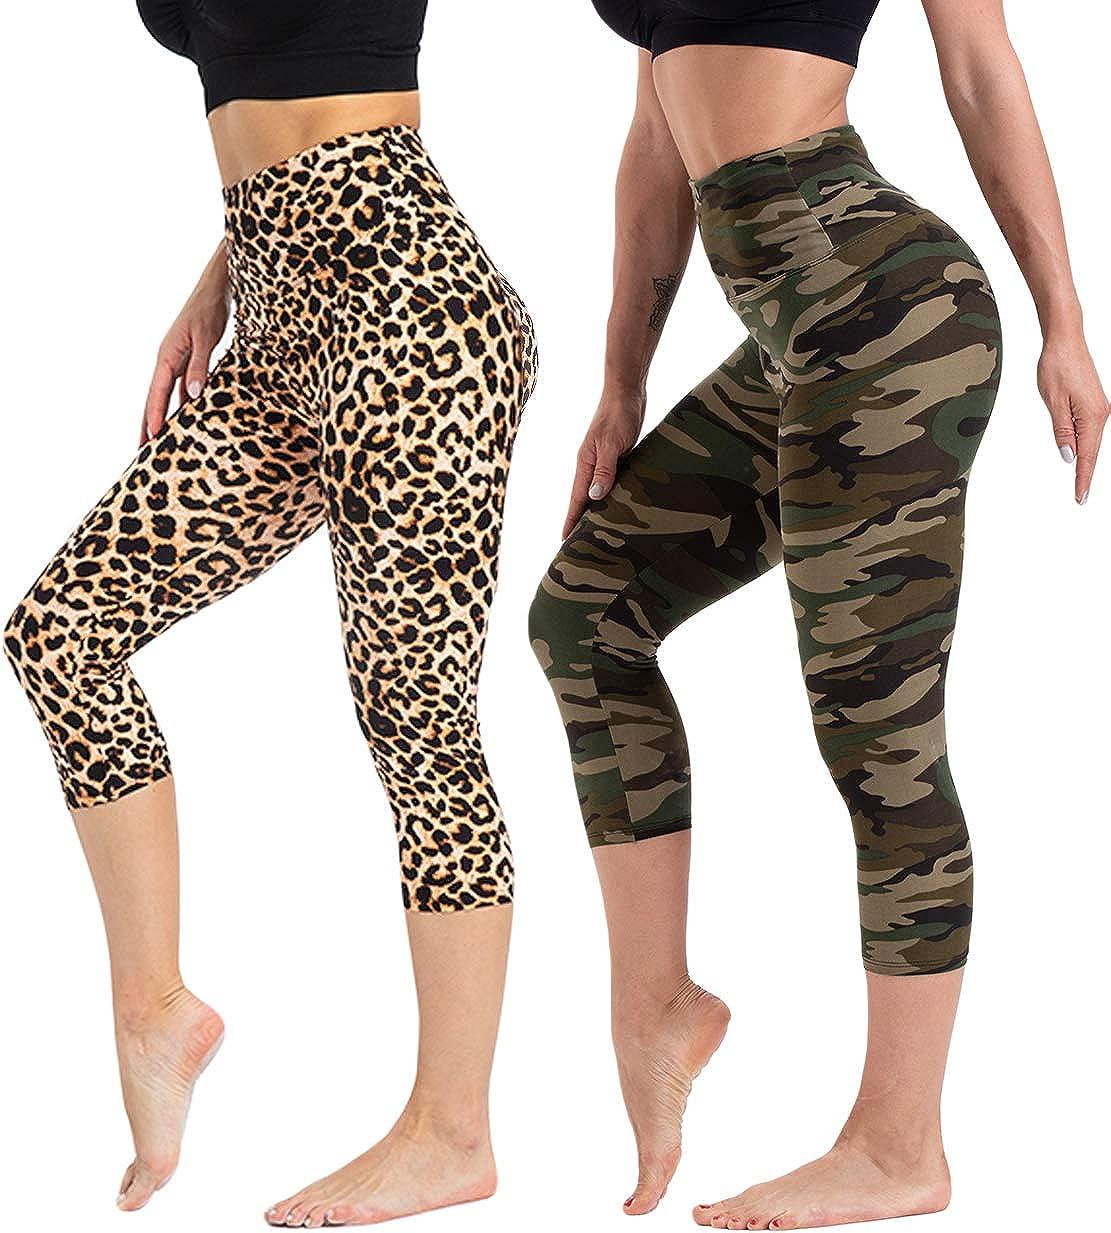 CAMPSNAIL High Waisted Pattern Leggings for Women Soft Tummy Control Printed Legging Capri & Full Length Workout Yoga Pants